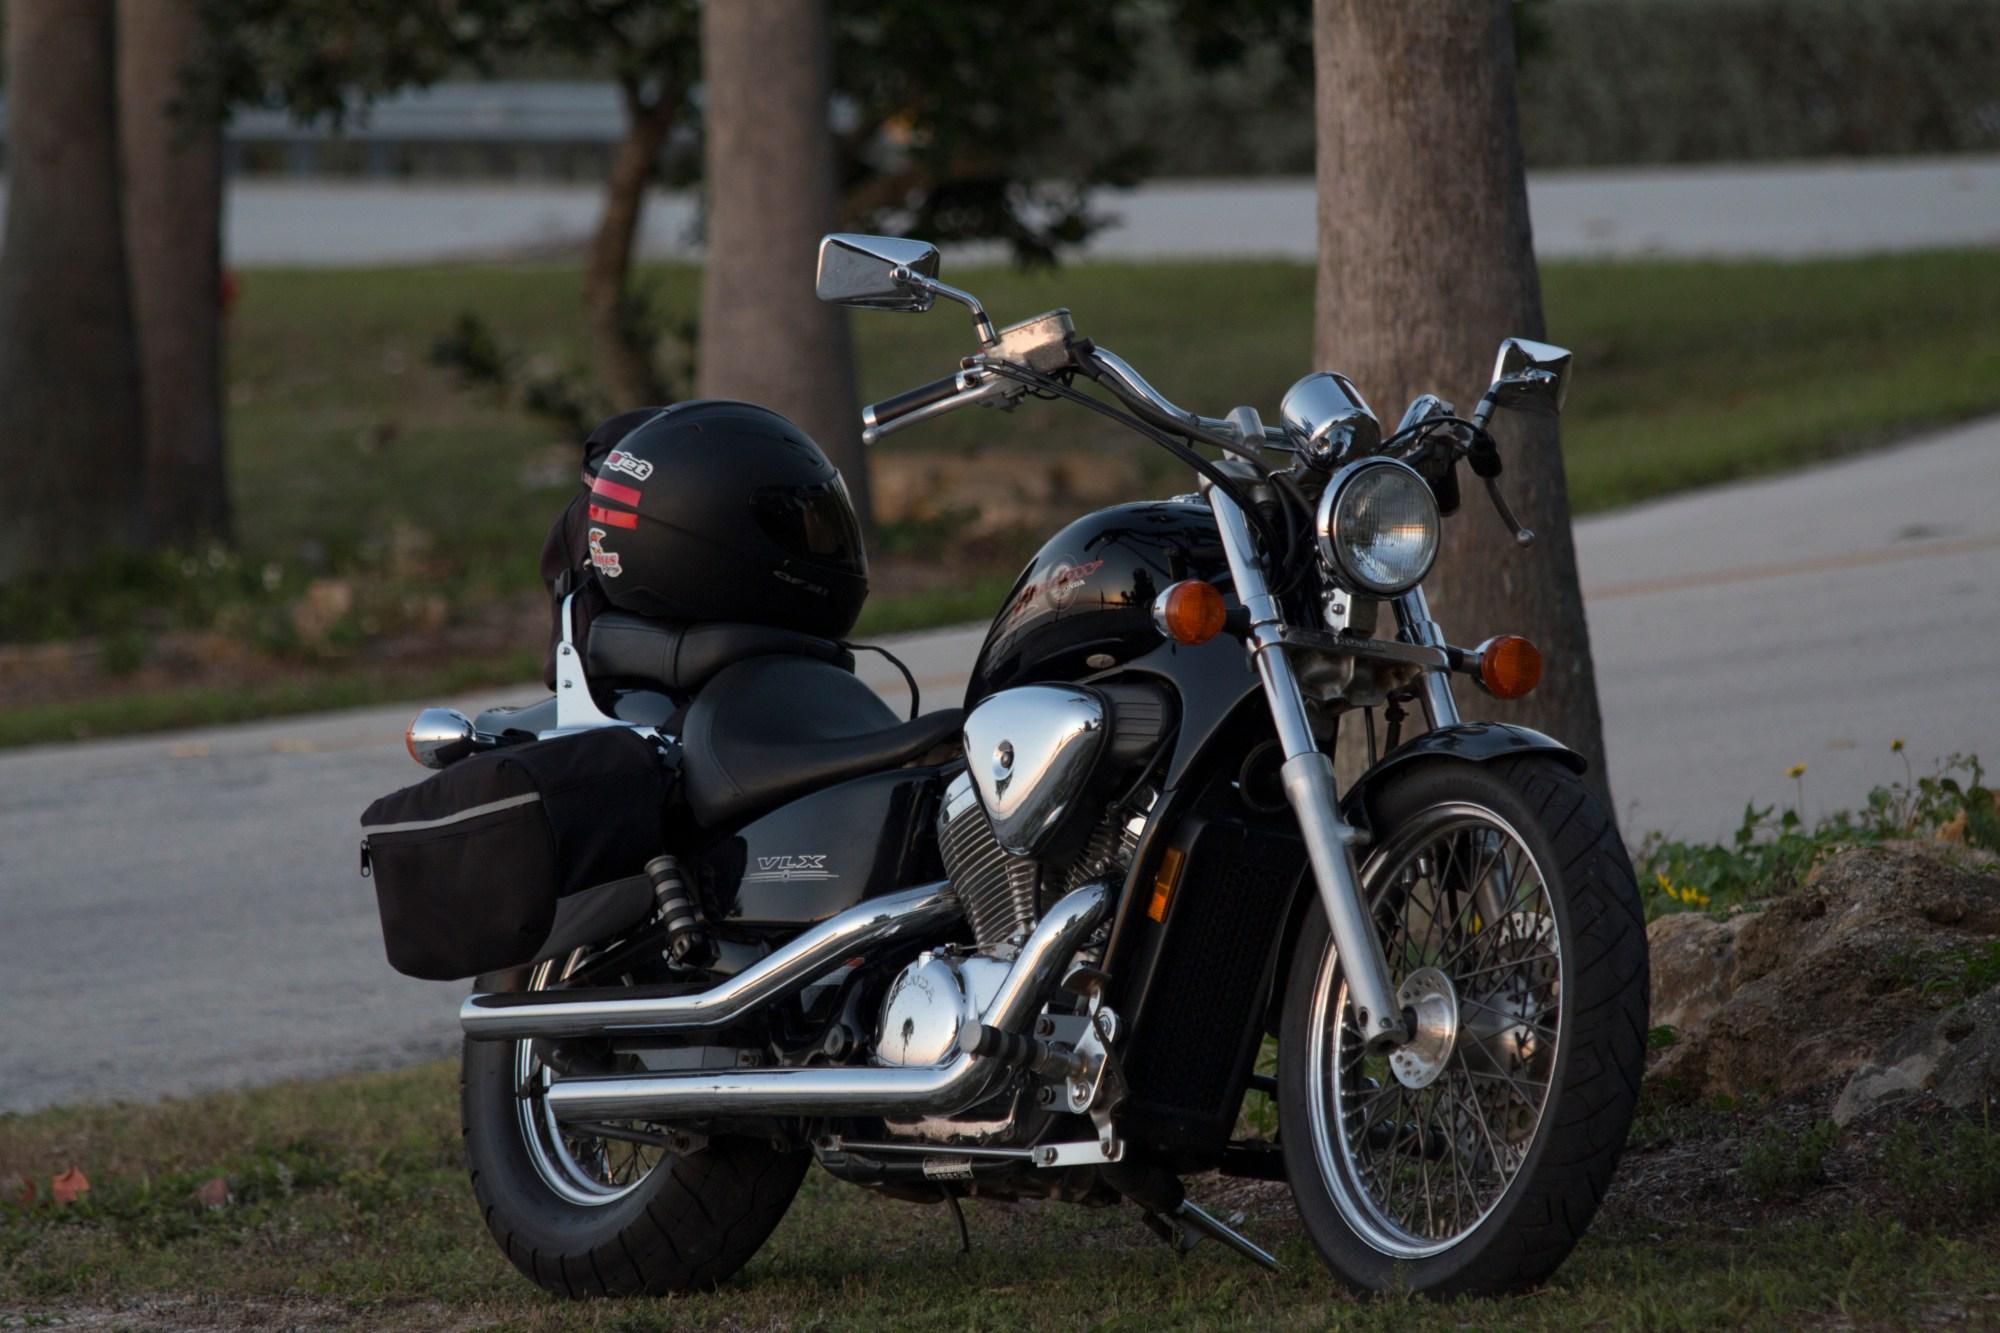 hight resolution of honda vt600c wikipedia honda motorcycle engine diagram further honda shadow 600 wikipedia the